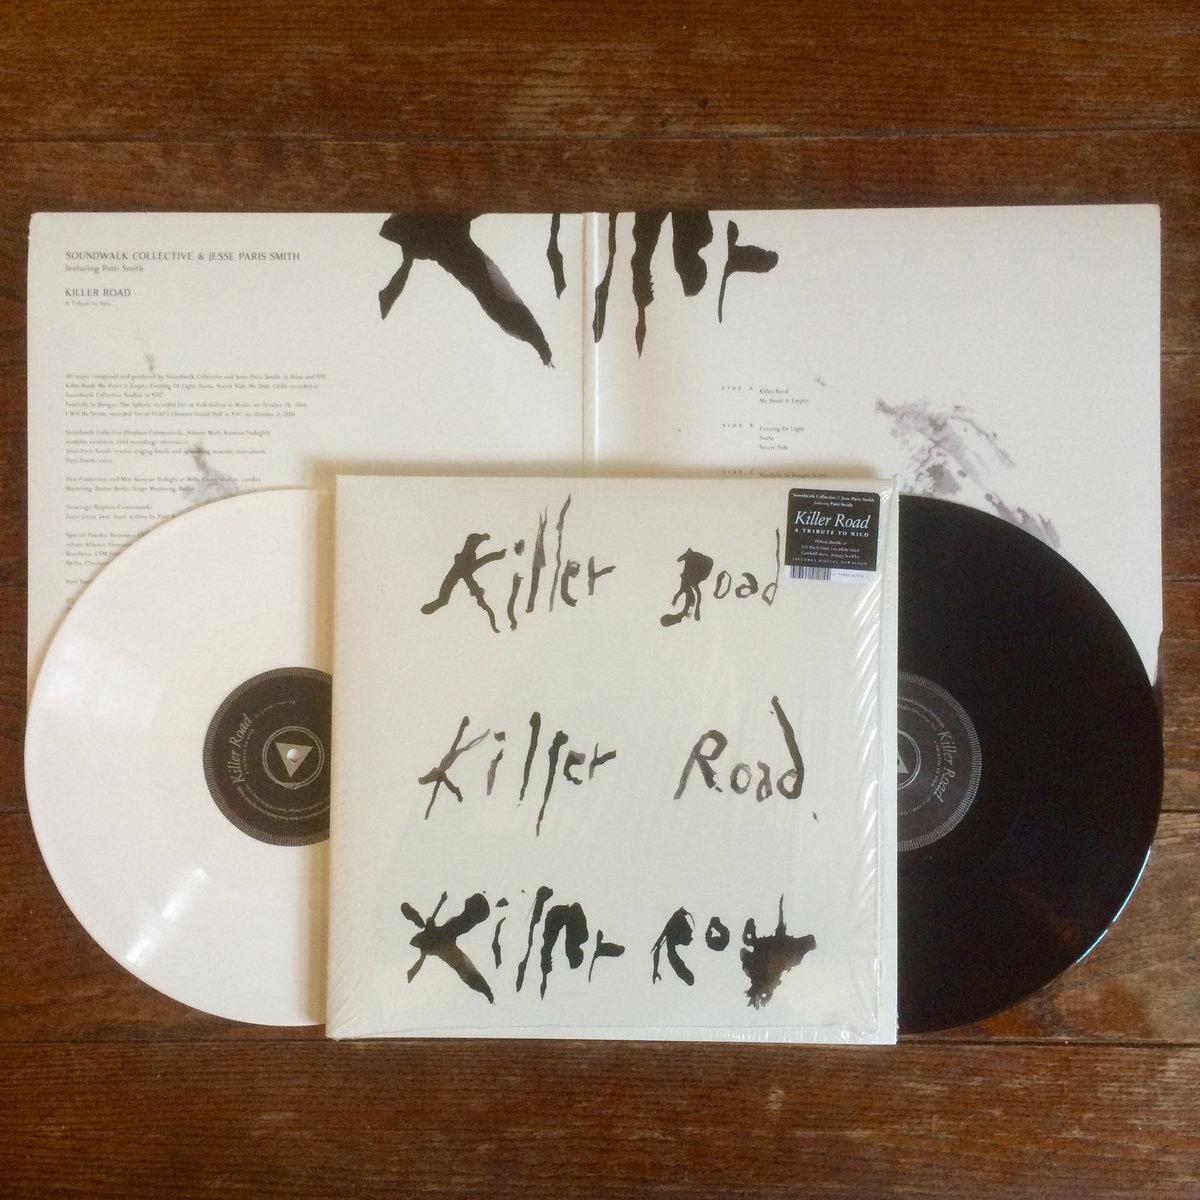 Killer Road   Soundwalk Collective with Jesse Paris Smith feat